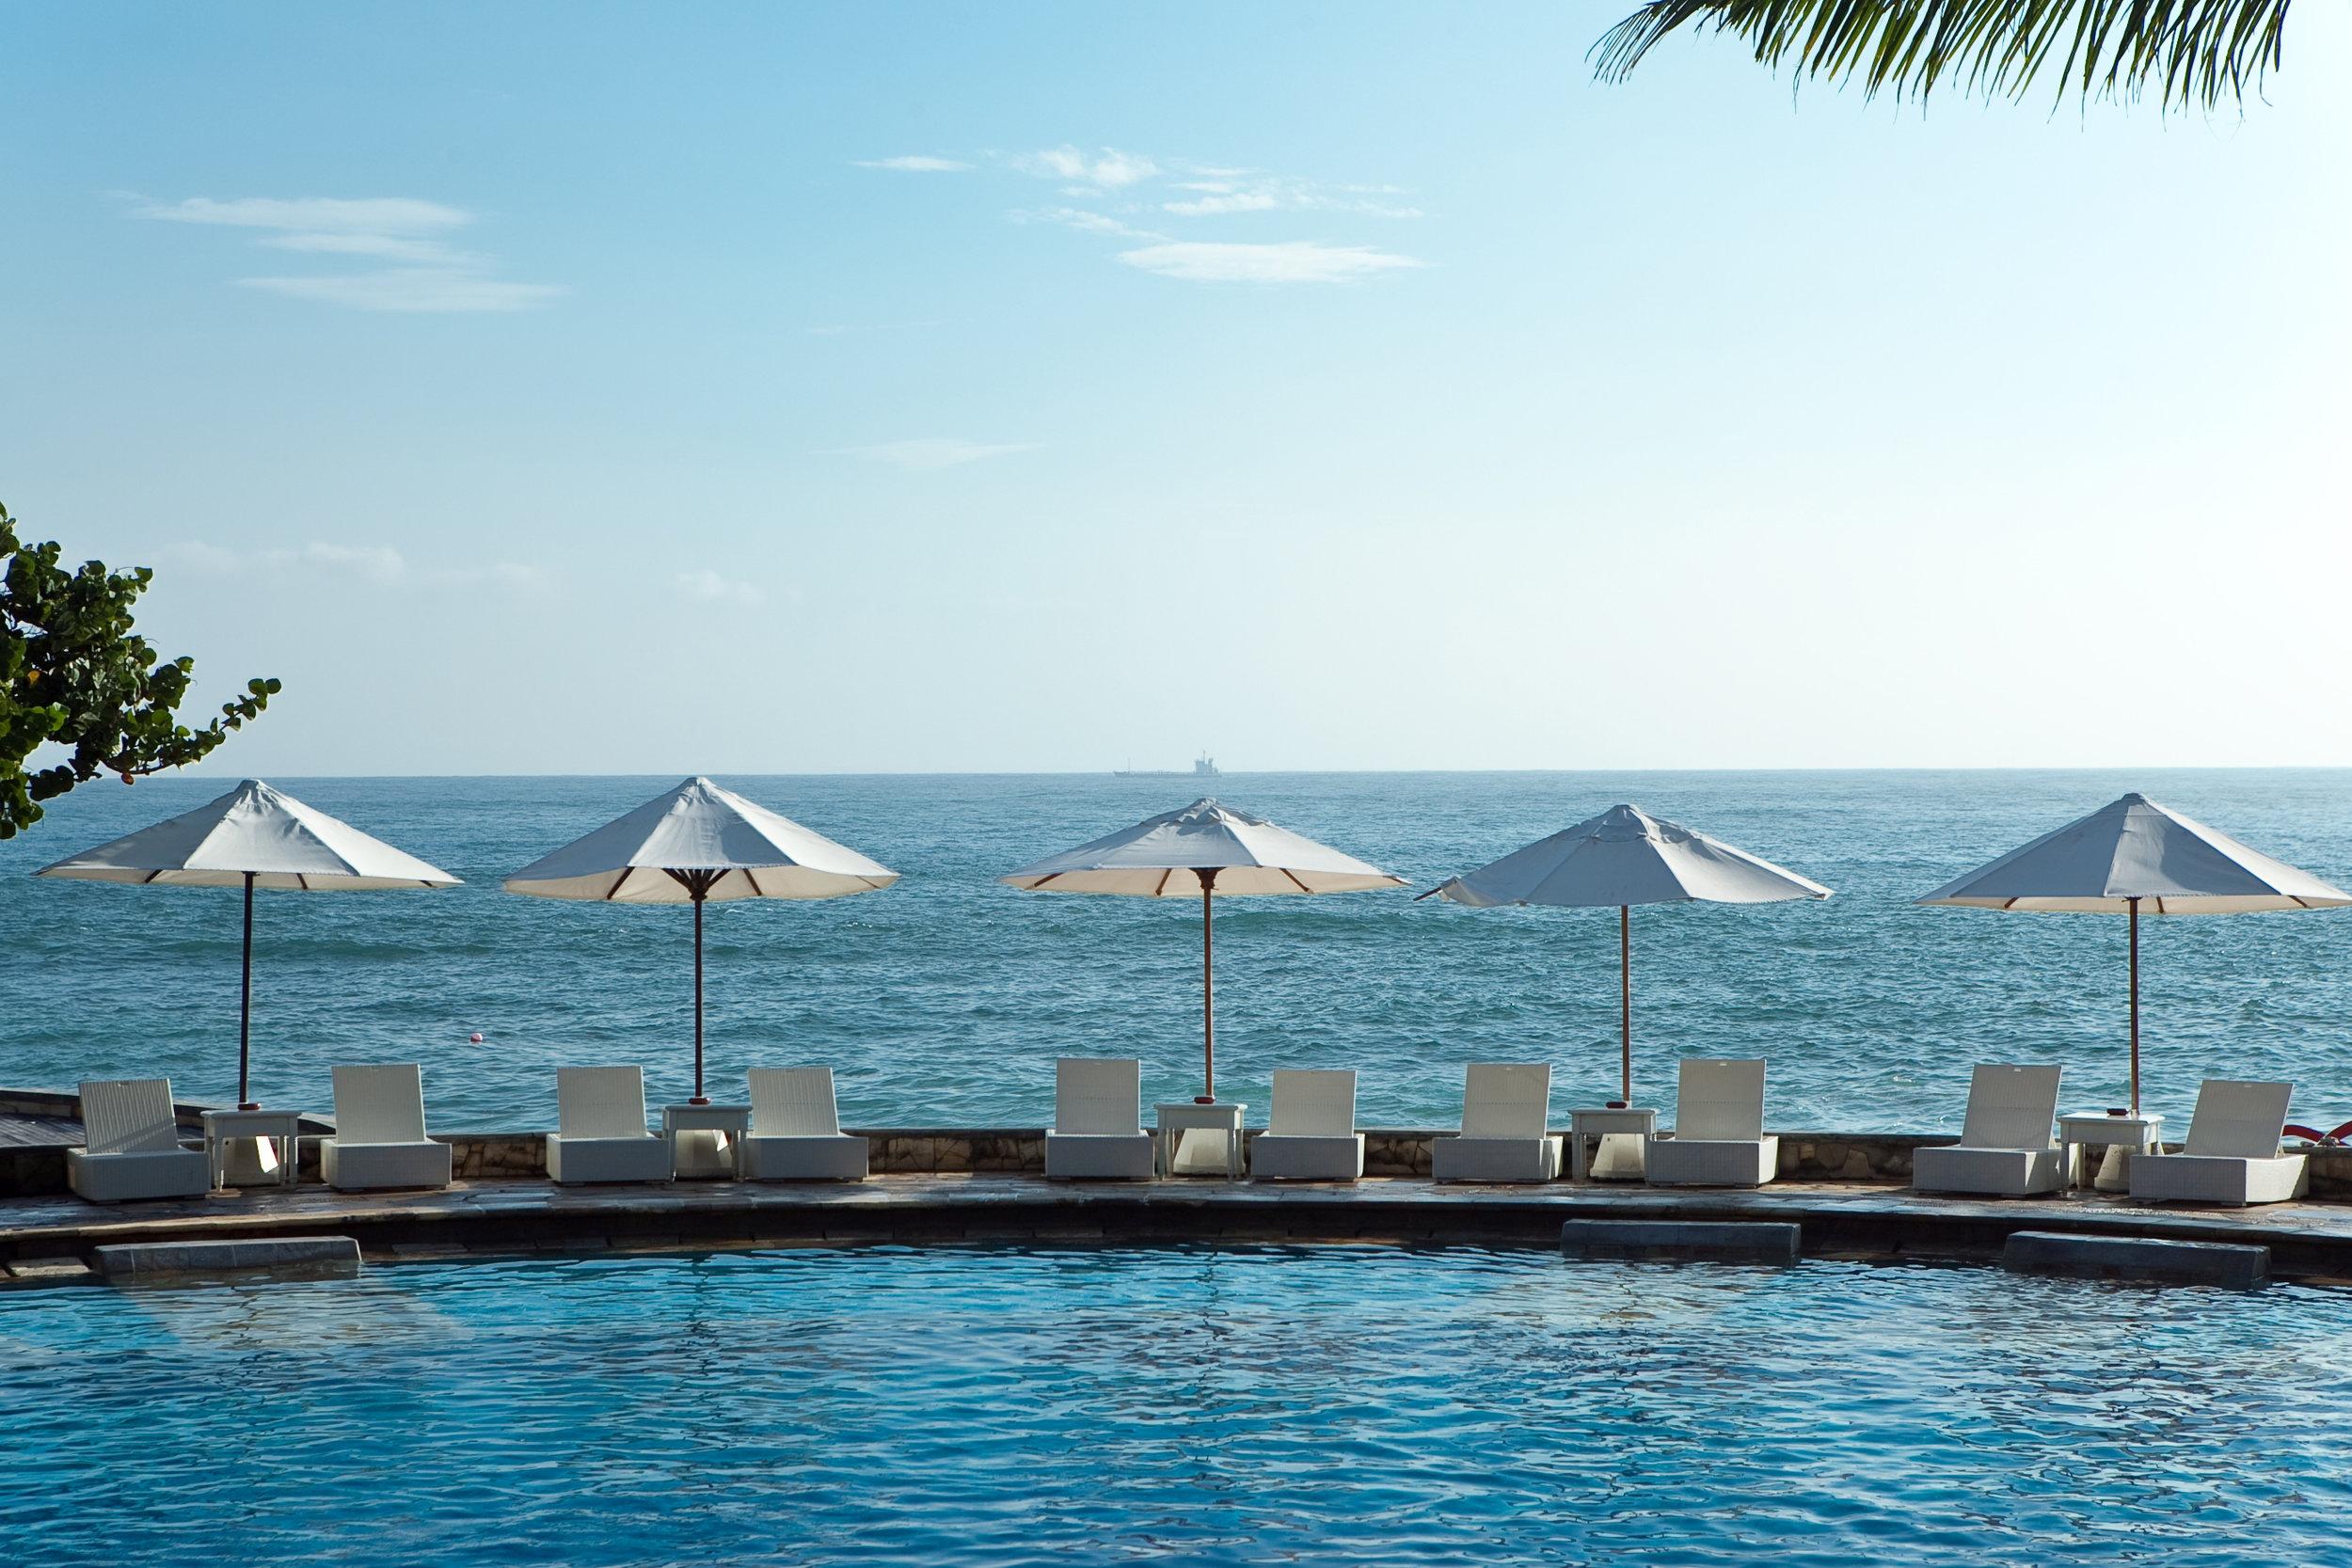 Swimming Pool by the Shore | Photo Credit: Hilton Bali Resort